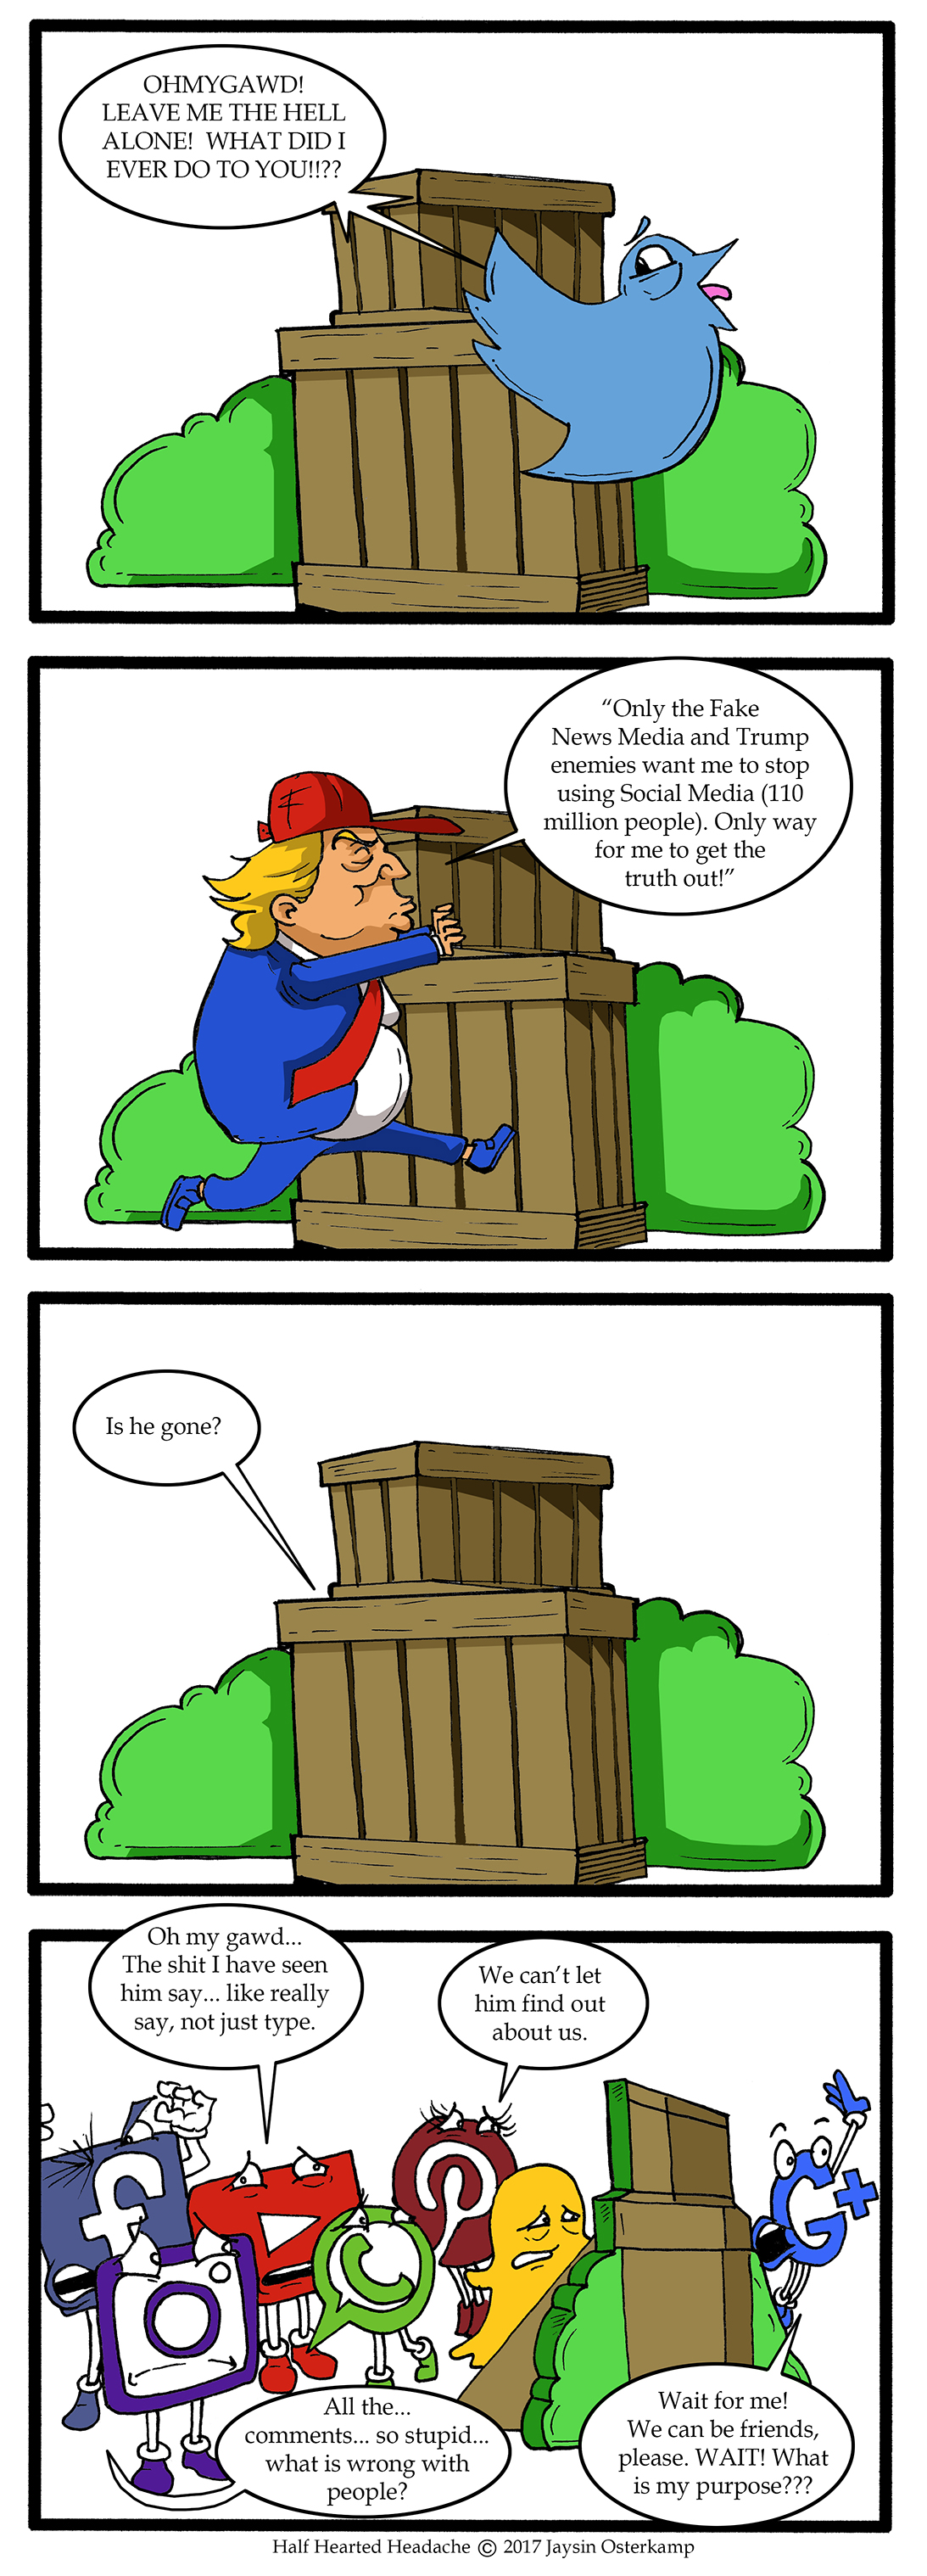 239 – Social media and Trump